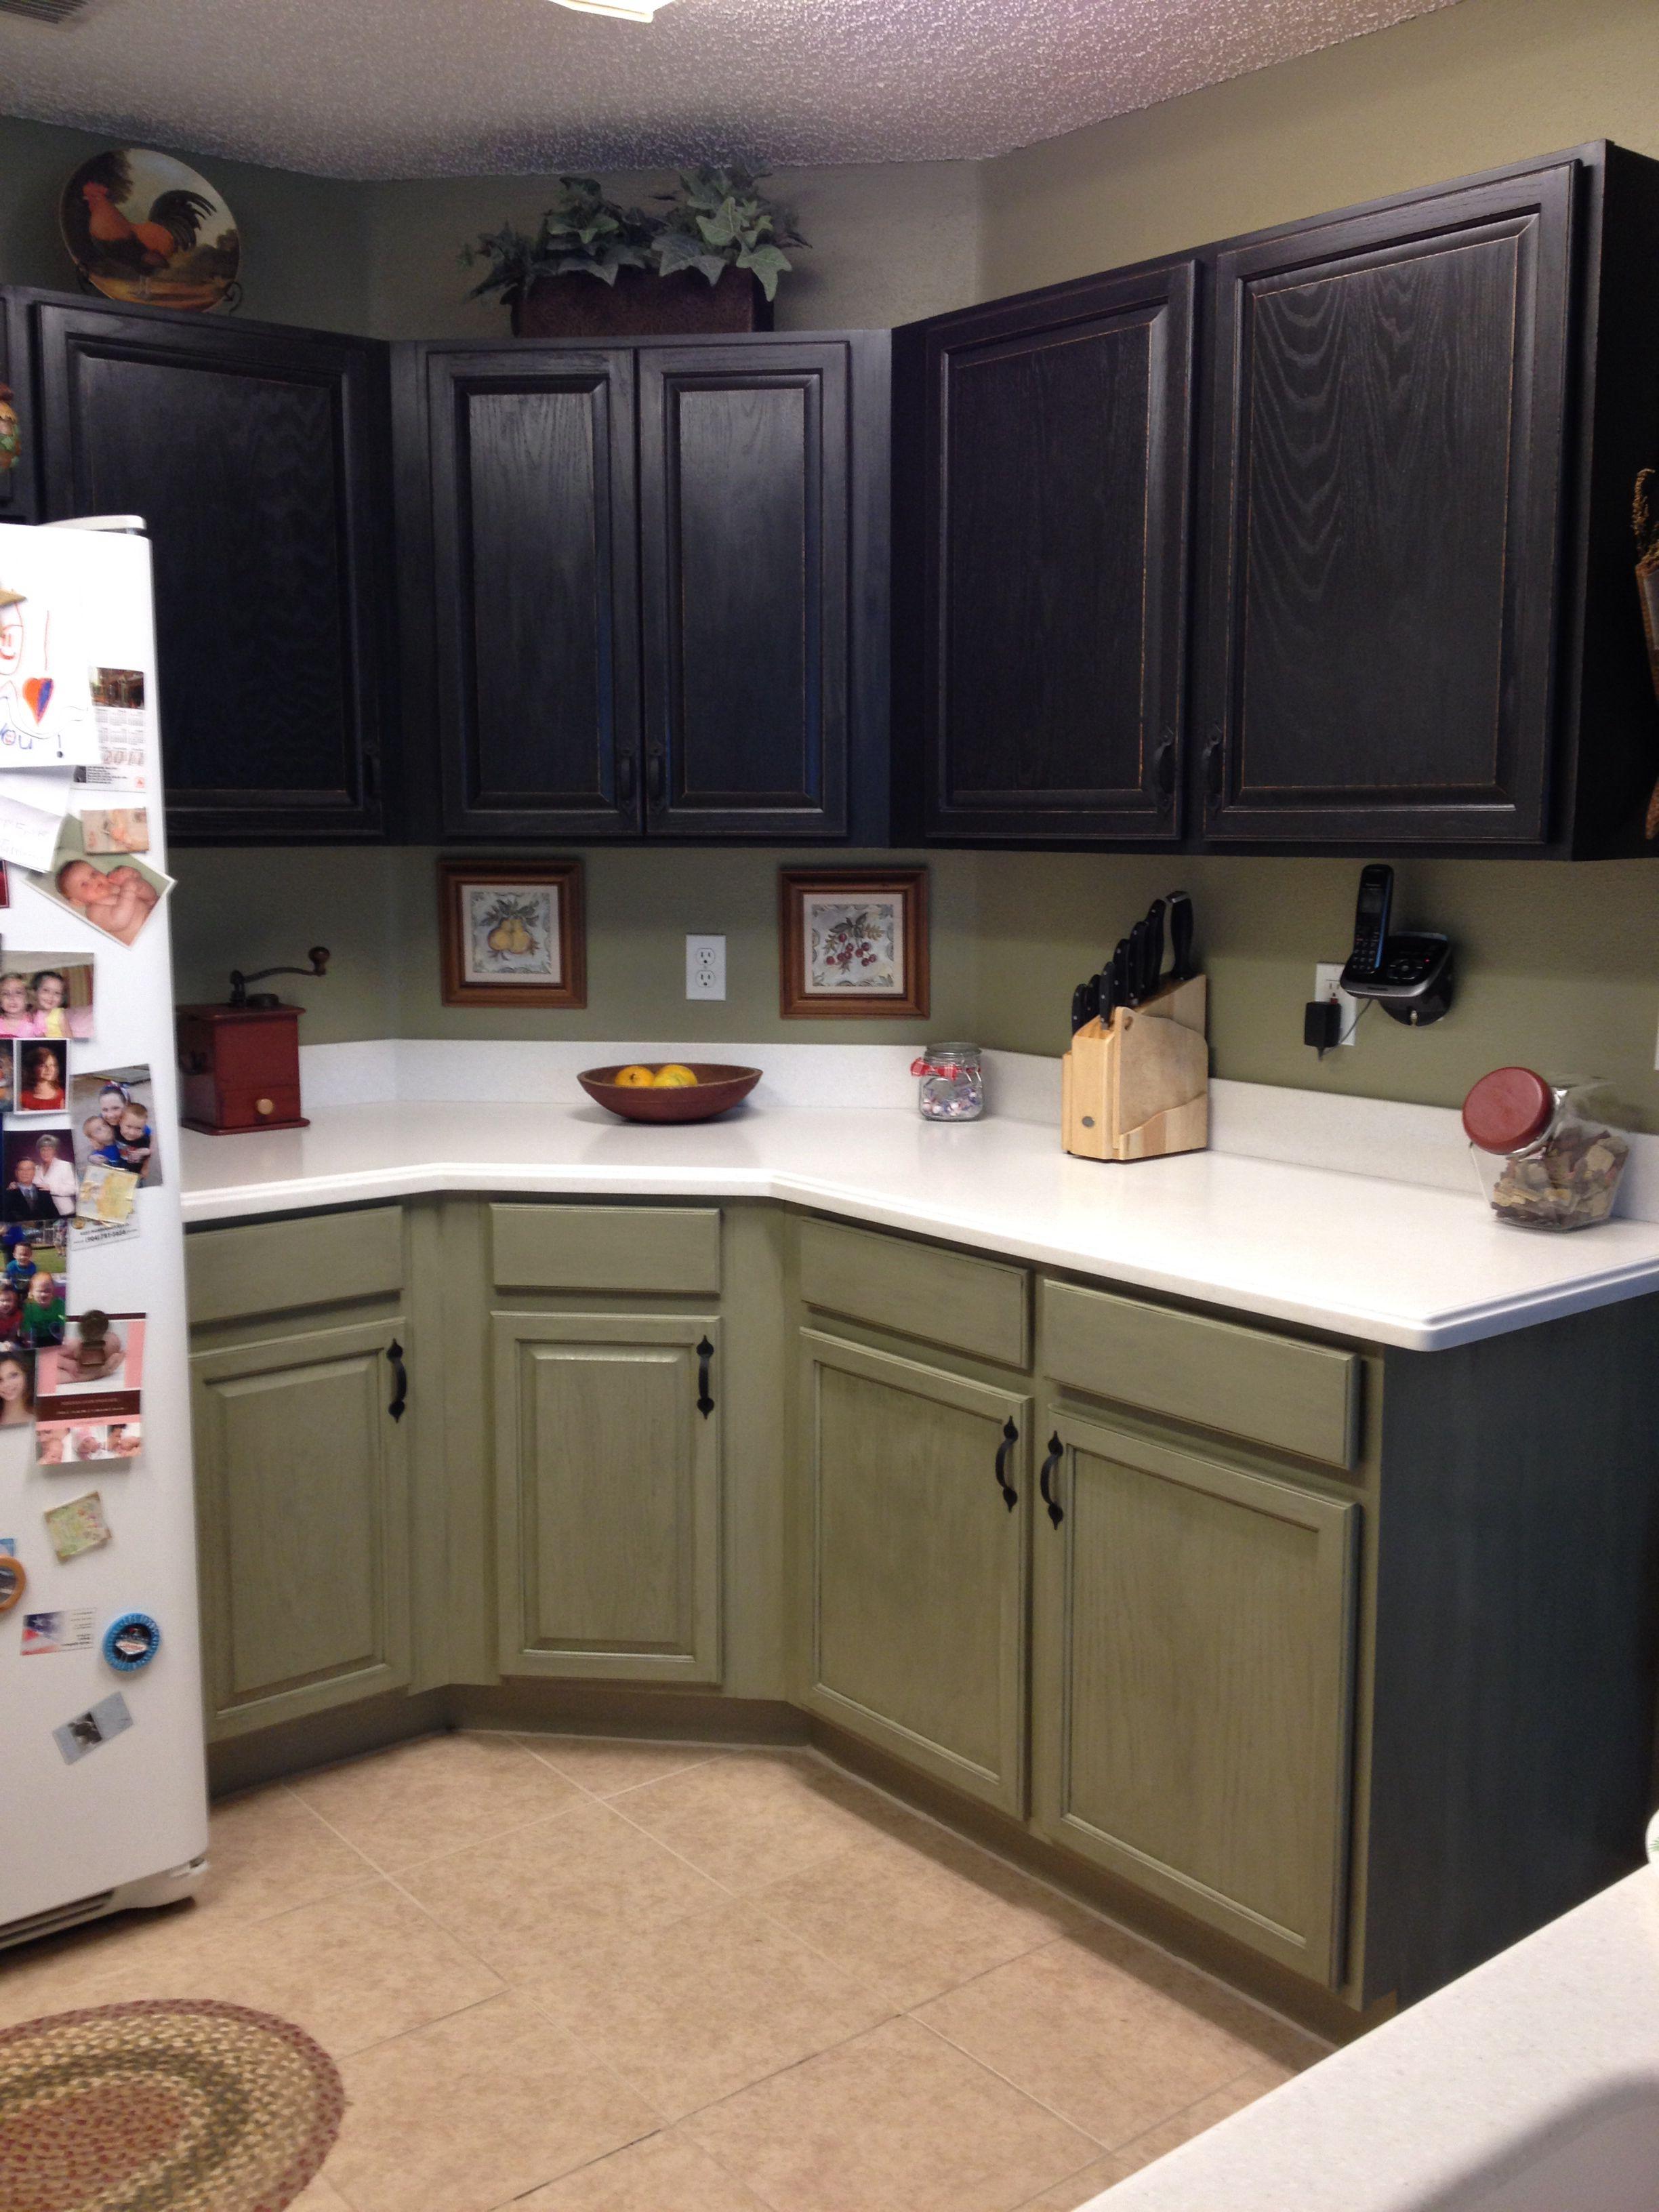 Pin By Jenny Stanley On Kitchen Cabinet Re Do Green Kitchen Cabinets Kitchen Cabinets Olive Green Kitchen